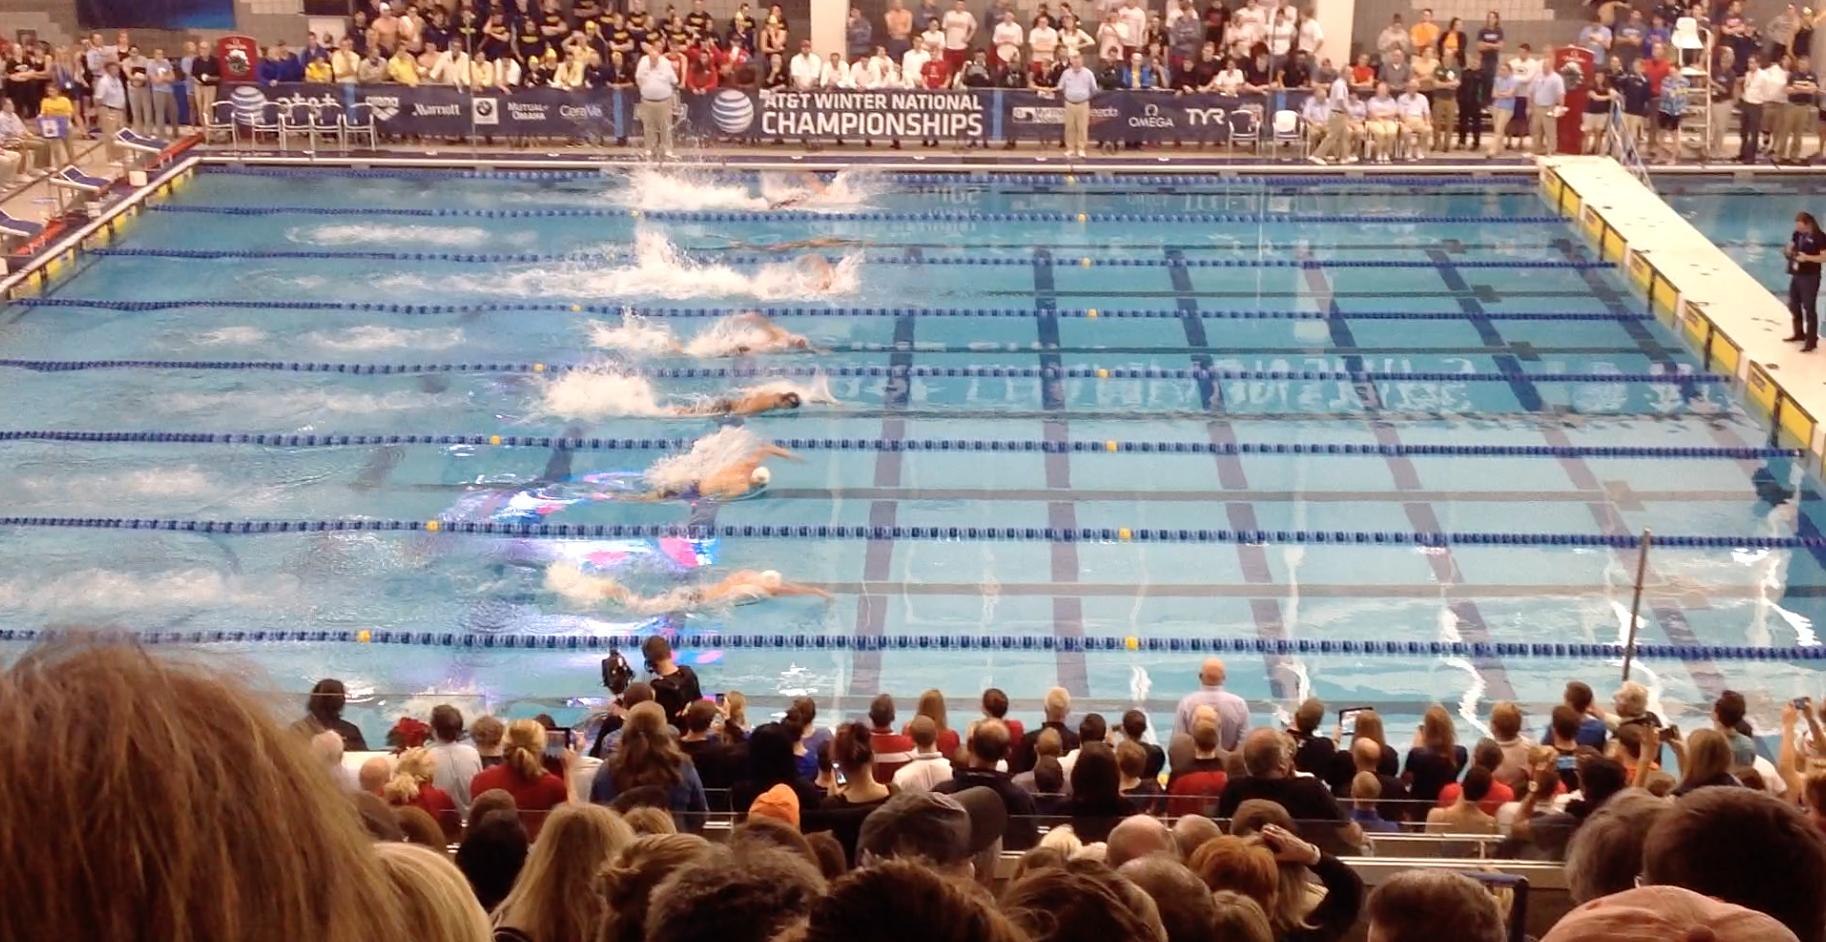 SCY, short course pool, USA swimming, short course yards, swimming pool, GAC